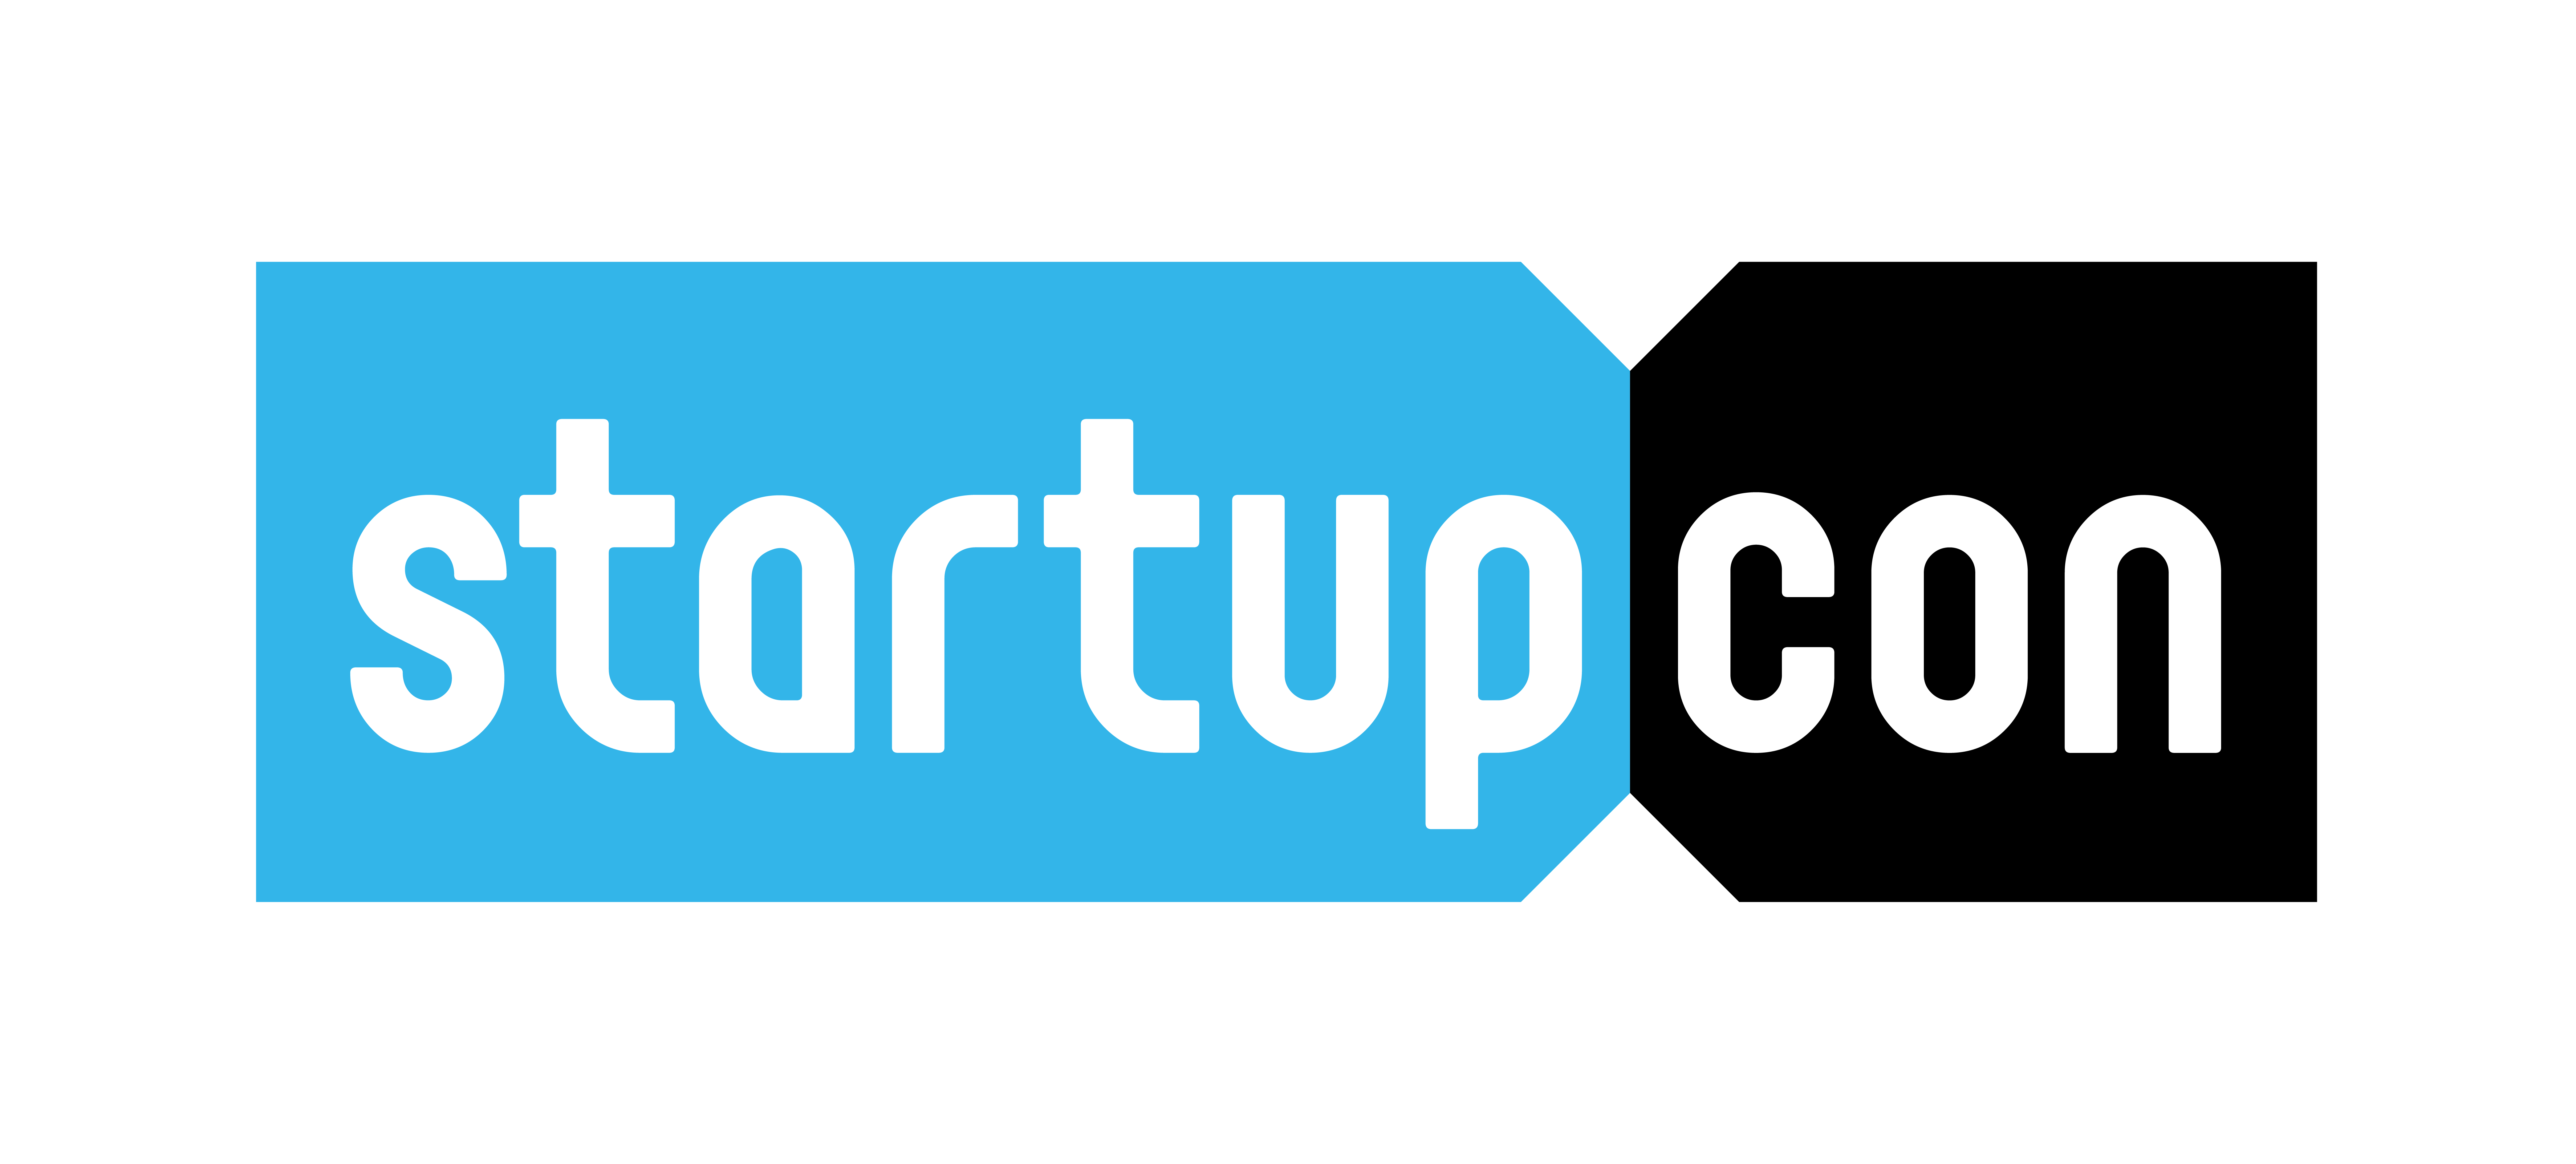 StartupCon Logo 2017 - Events